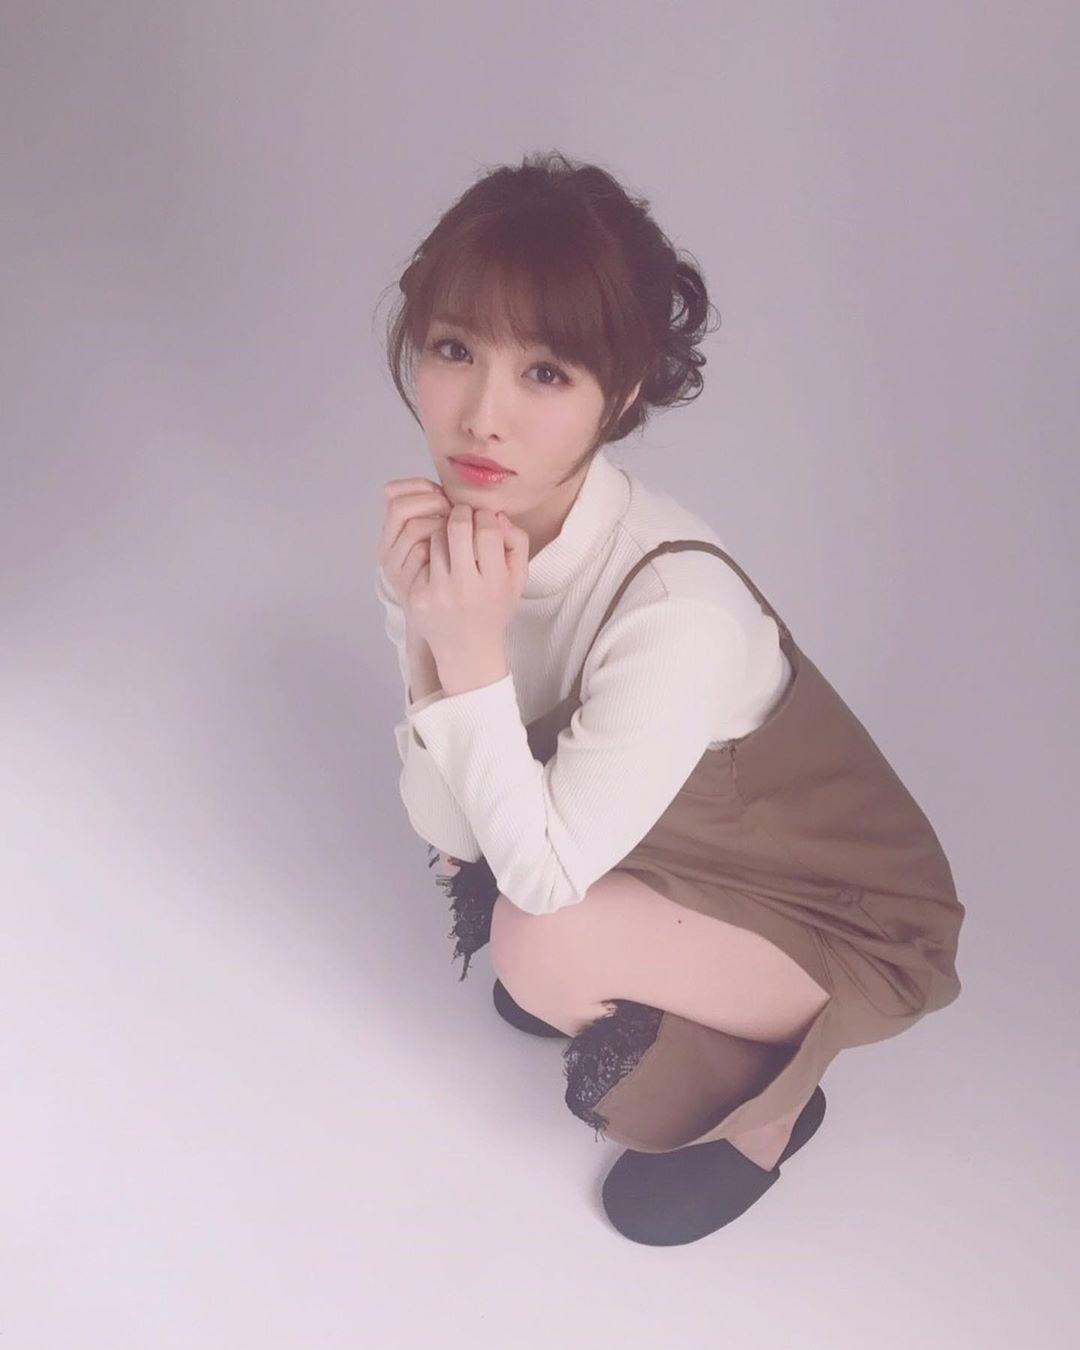 konno_anna285.jpg